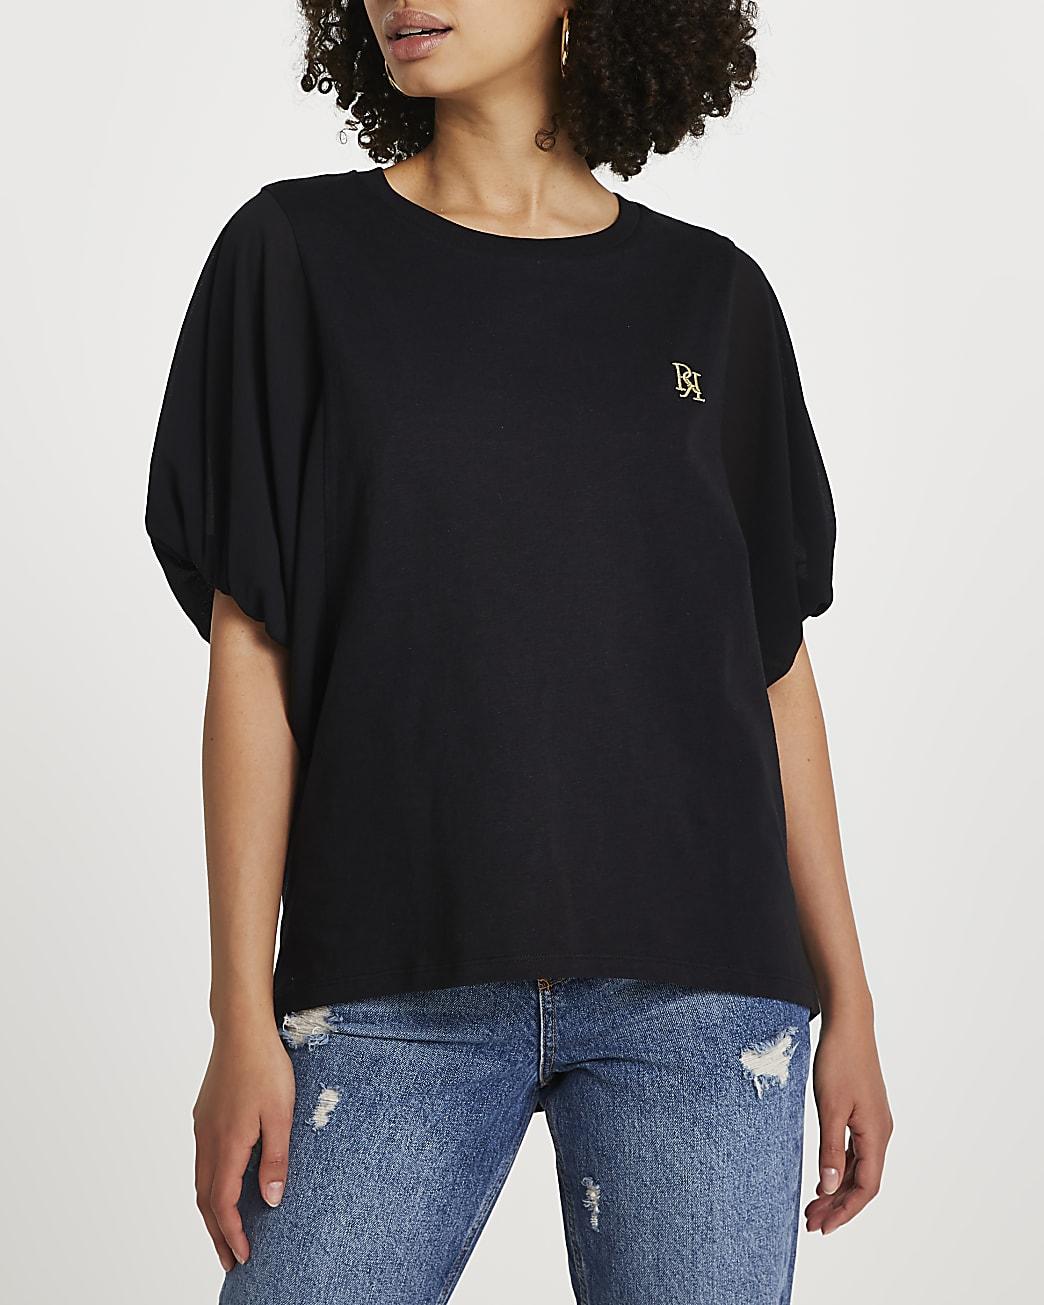 Black short sleeve woven batwing top